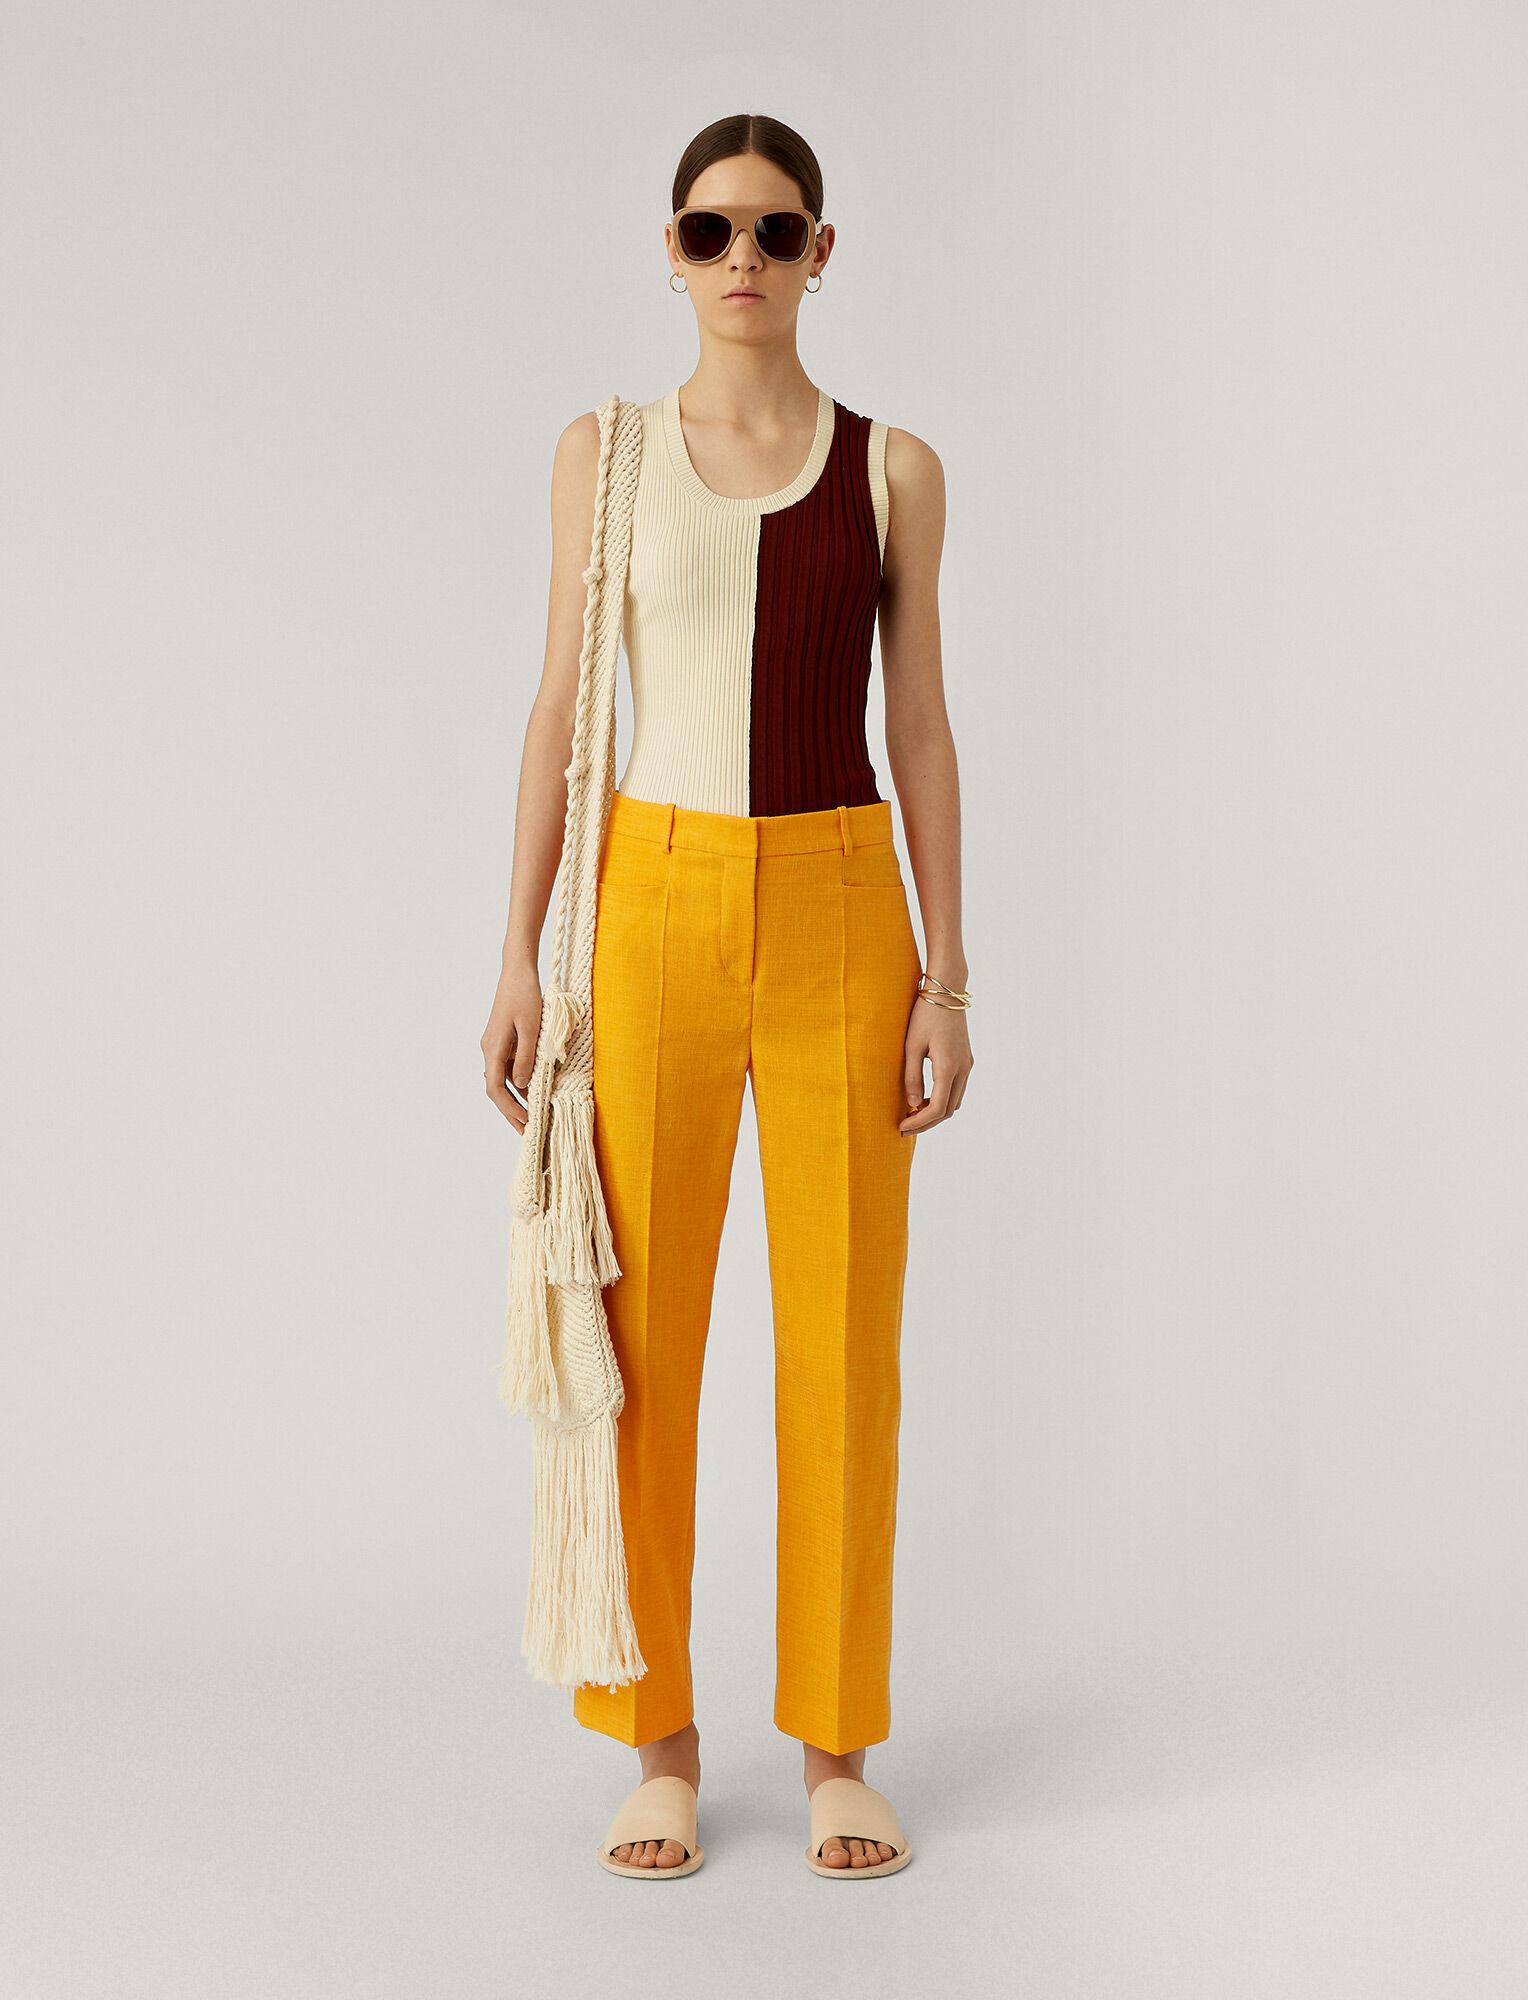 Joseph, Sloe Shantung Linen Trousers, in TANGERINE